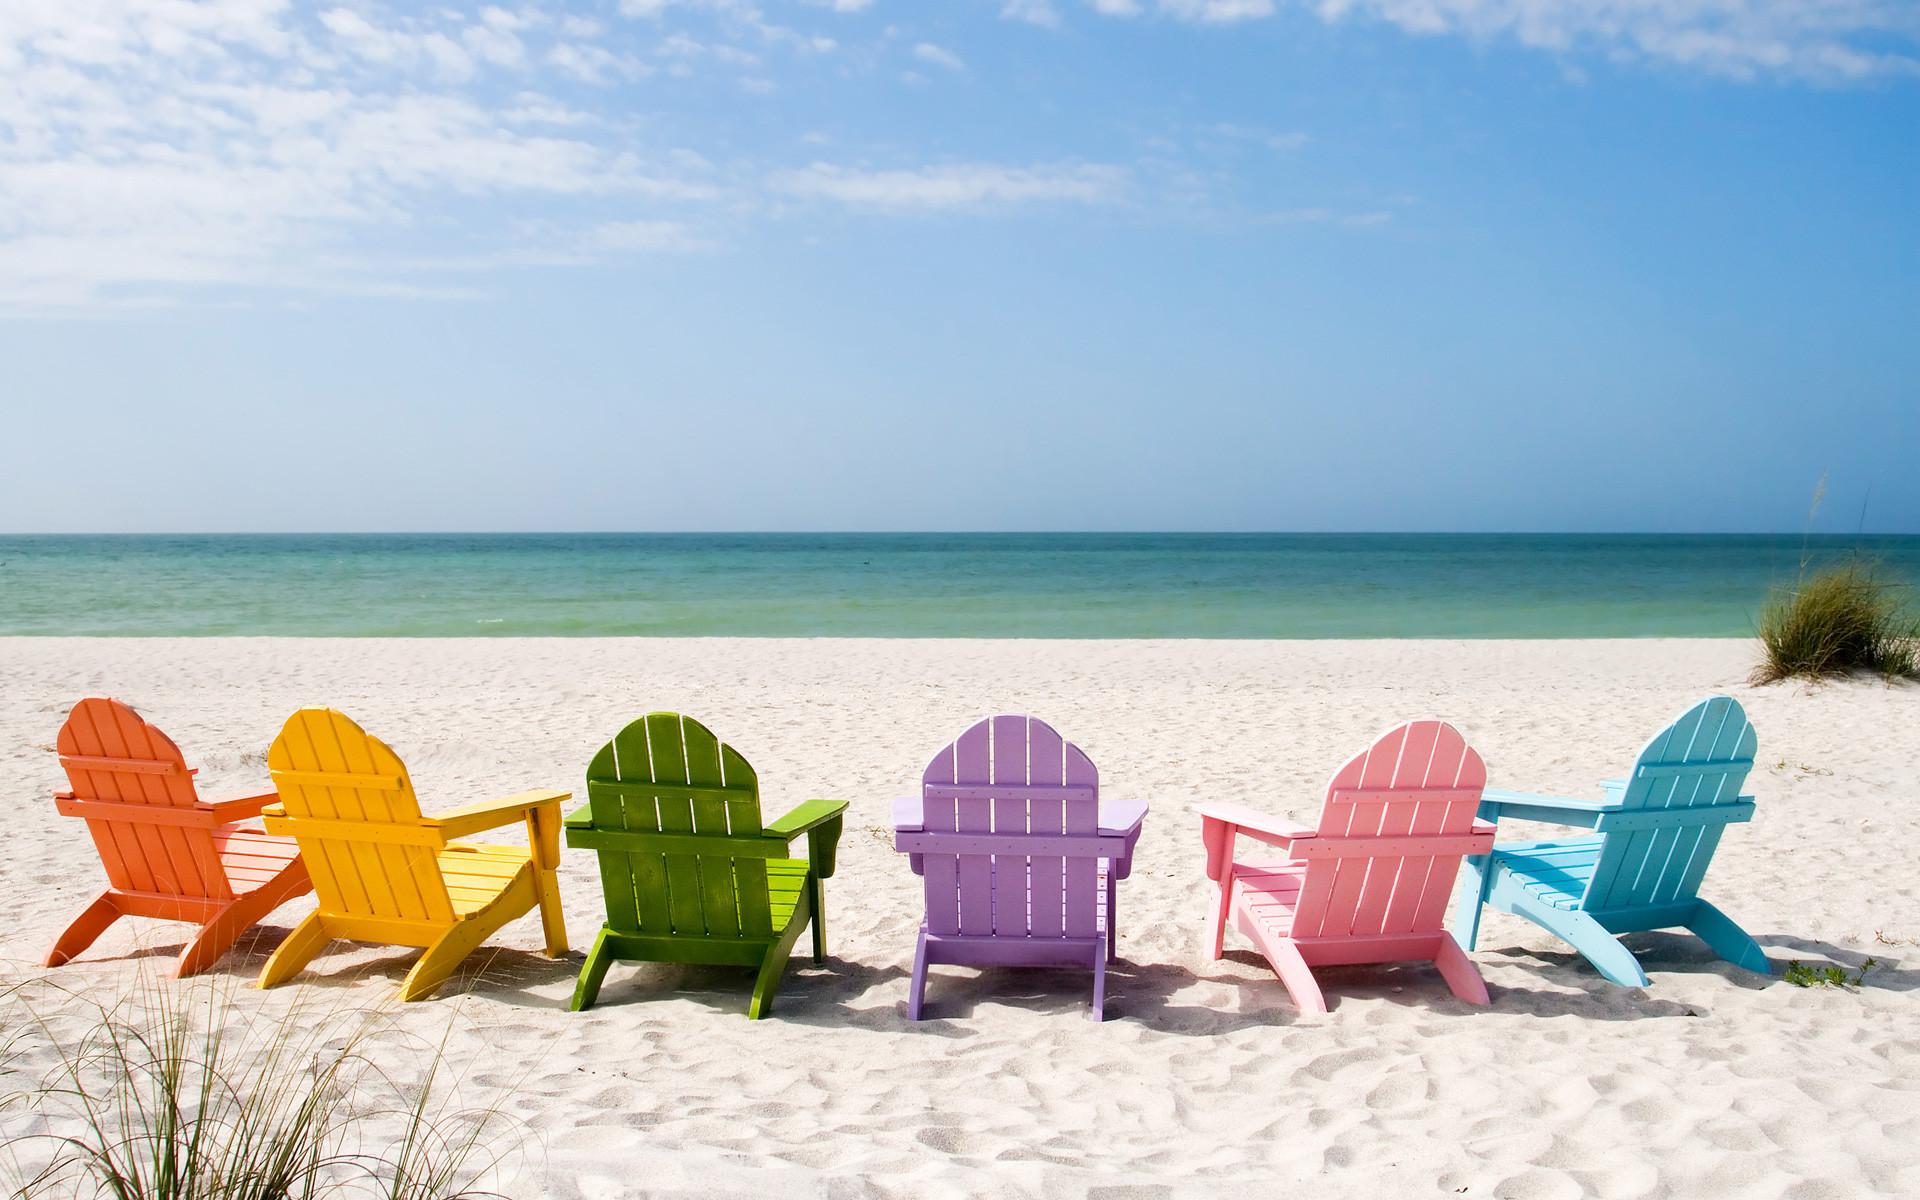 FL Wins 3 of 5 Spots for TripAdvisor's Underrated Beach Towns